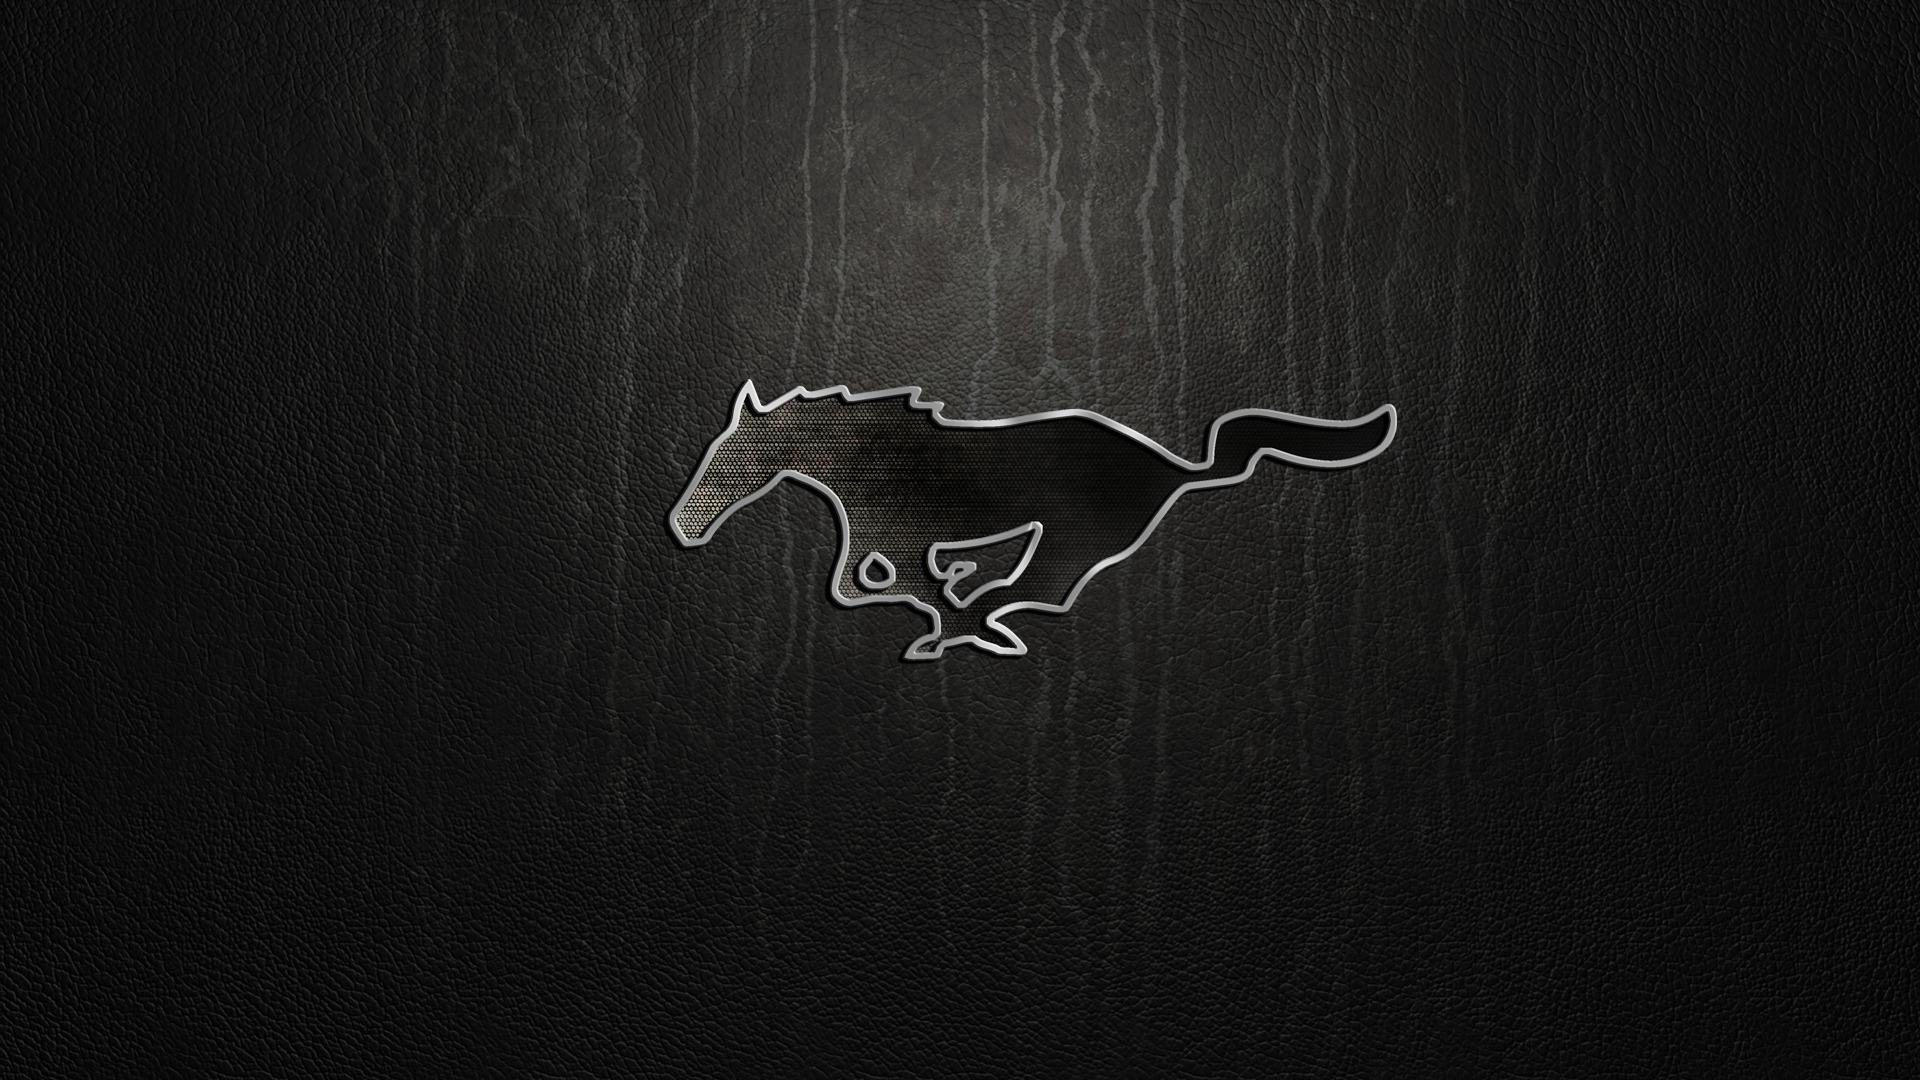 Mustang Logo Wallpaper For Iphone Gtc